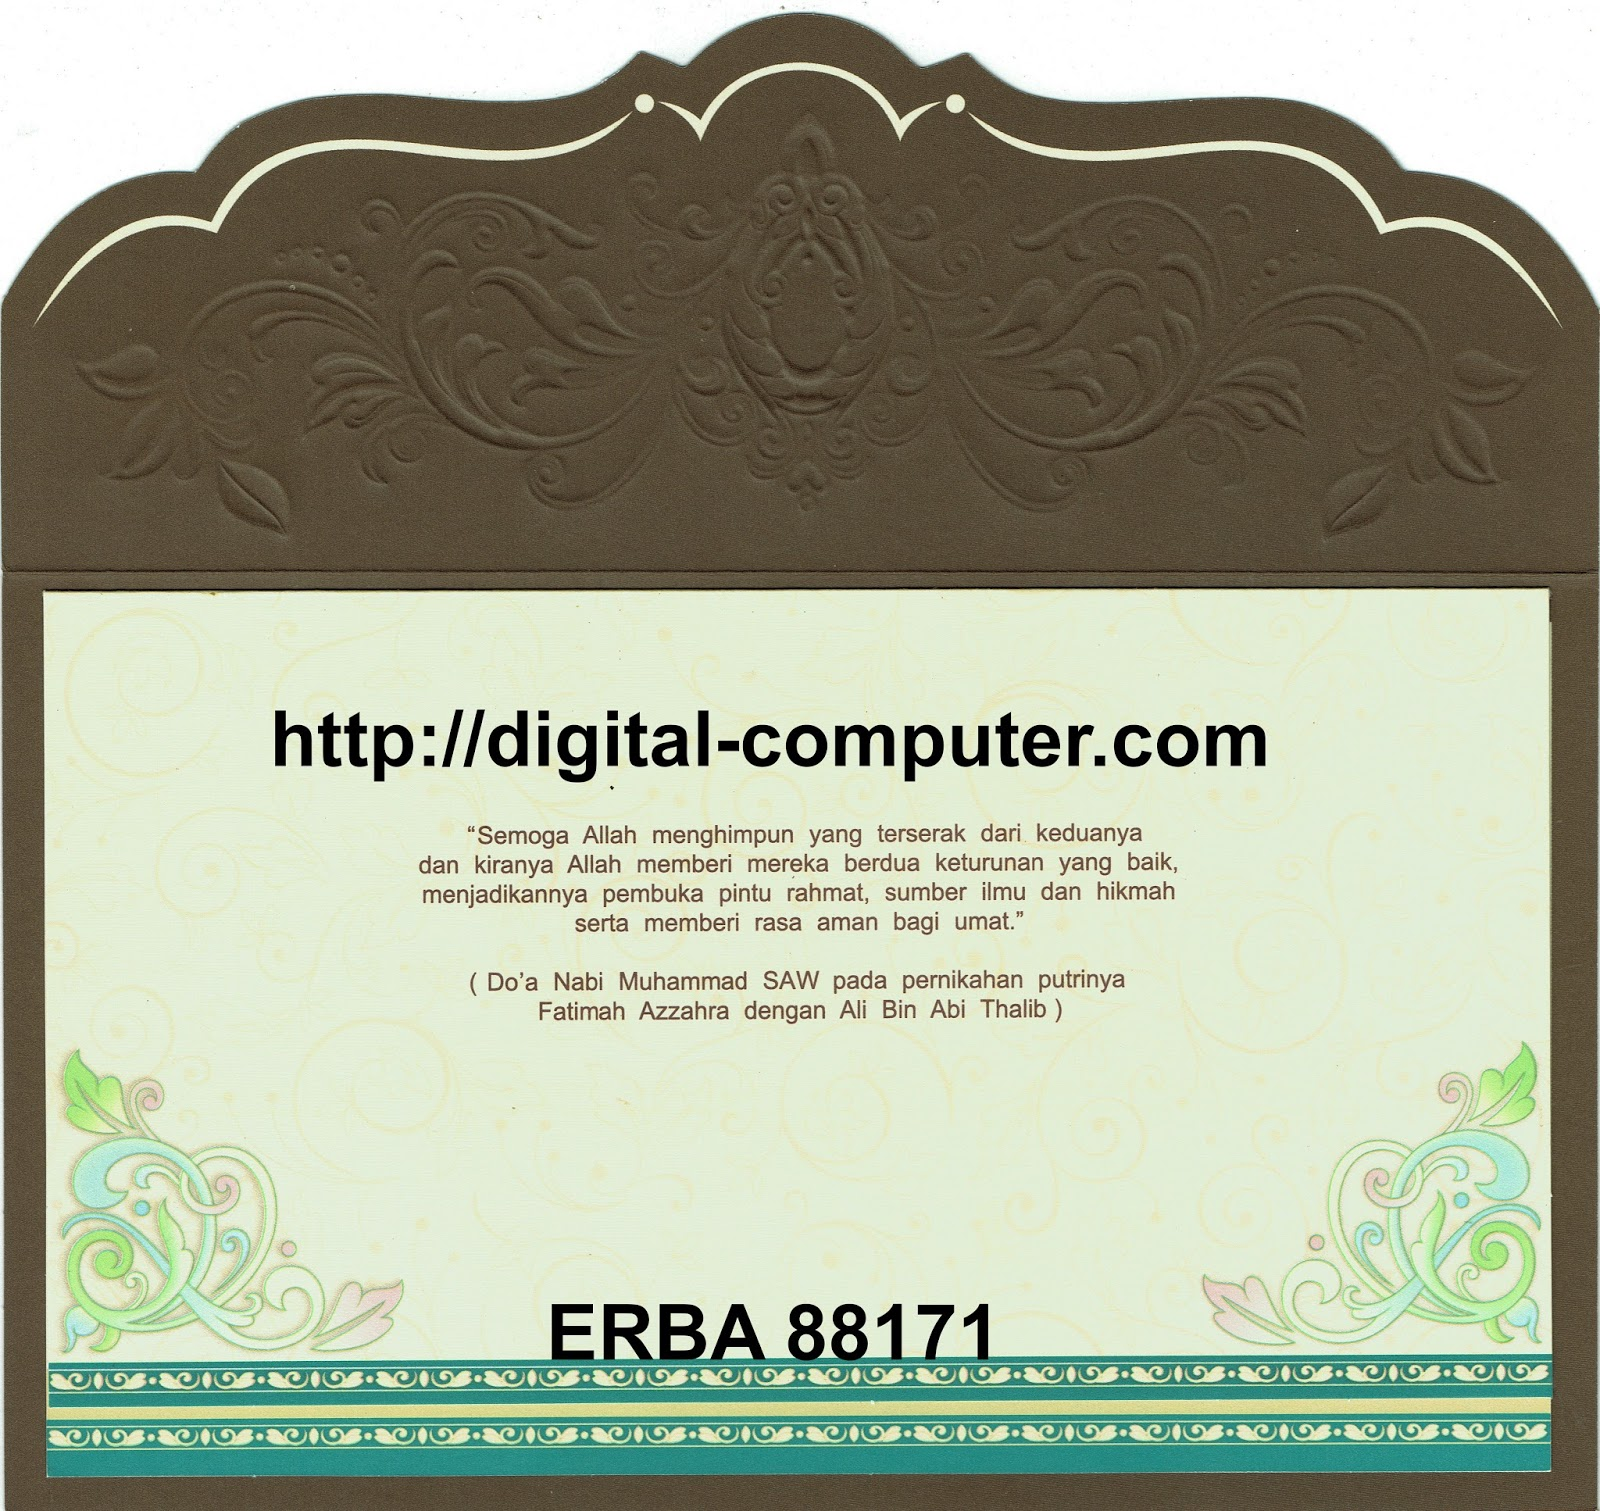 Undangan Softcover ERBA 88171